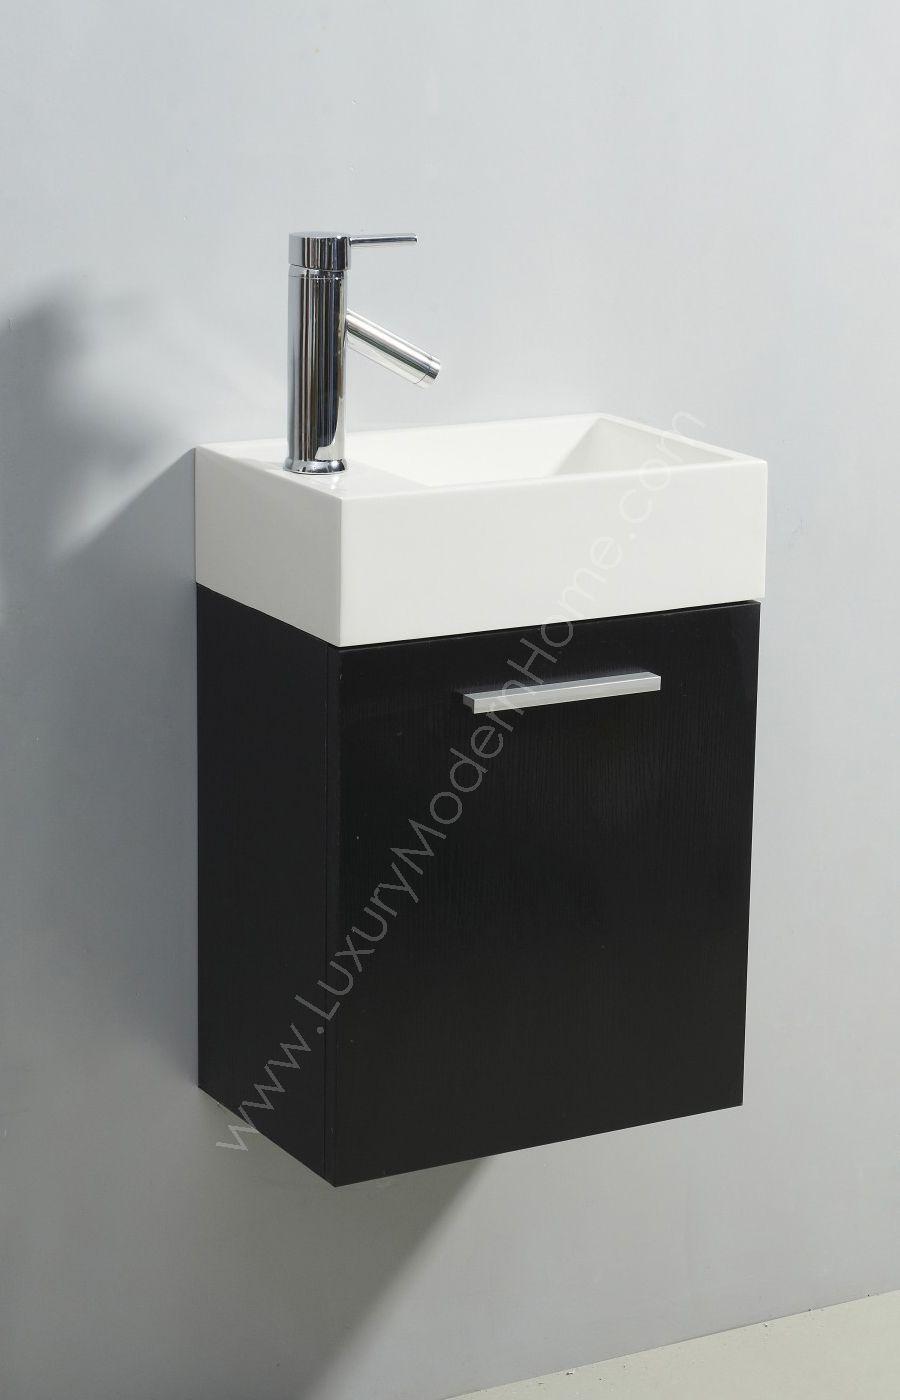 Wg E Aleius Inch Small Bathroom Vanity Sink Sinks Cabinet Espresso Wall Hung Mount